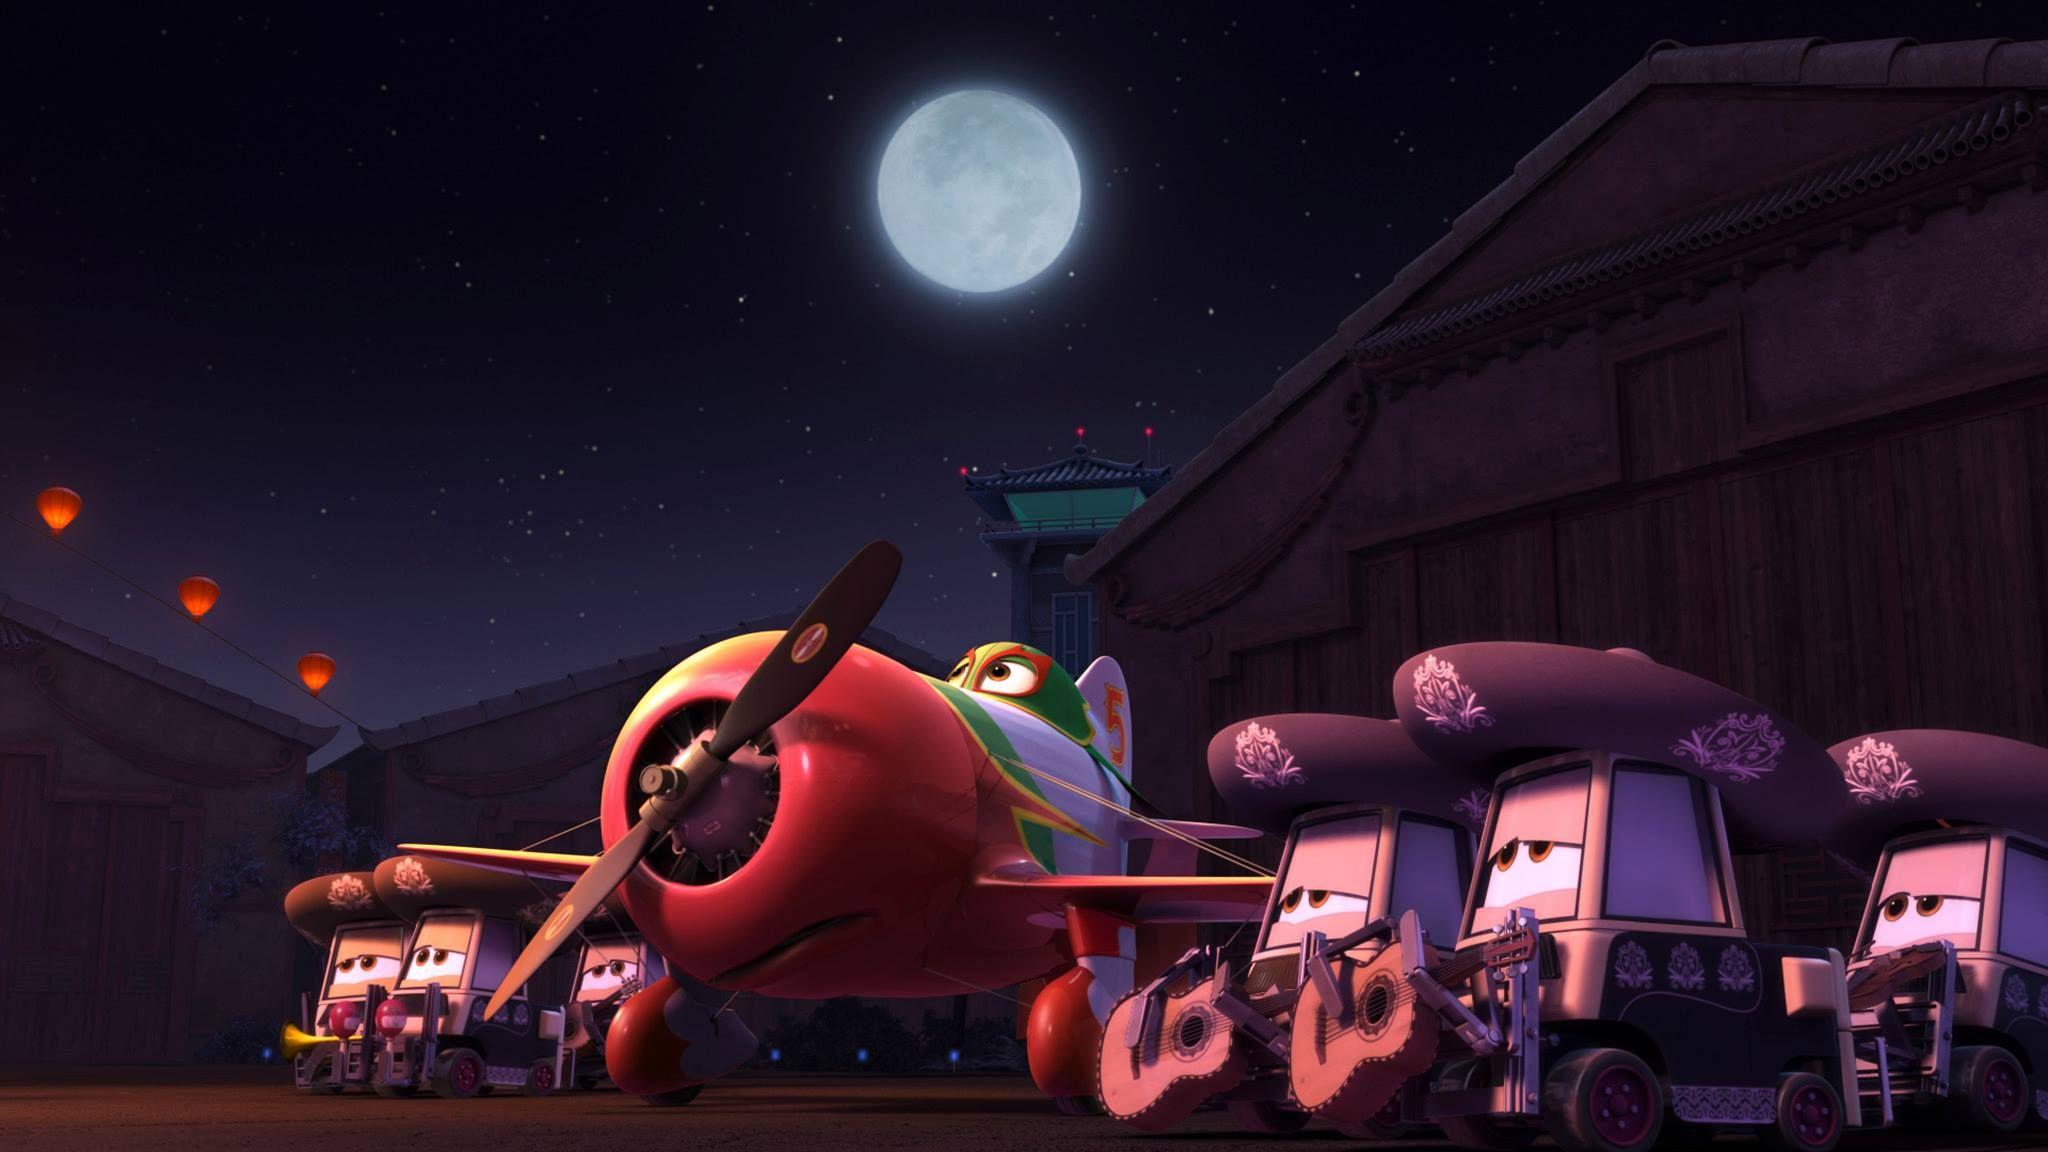 I M Just A Love Machine El Chupacabra Disney Planes Disney Pixar Characters Disney